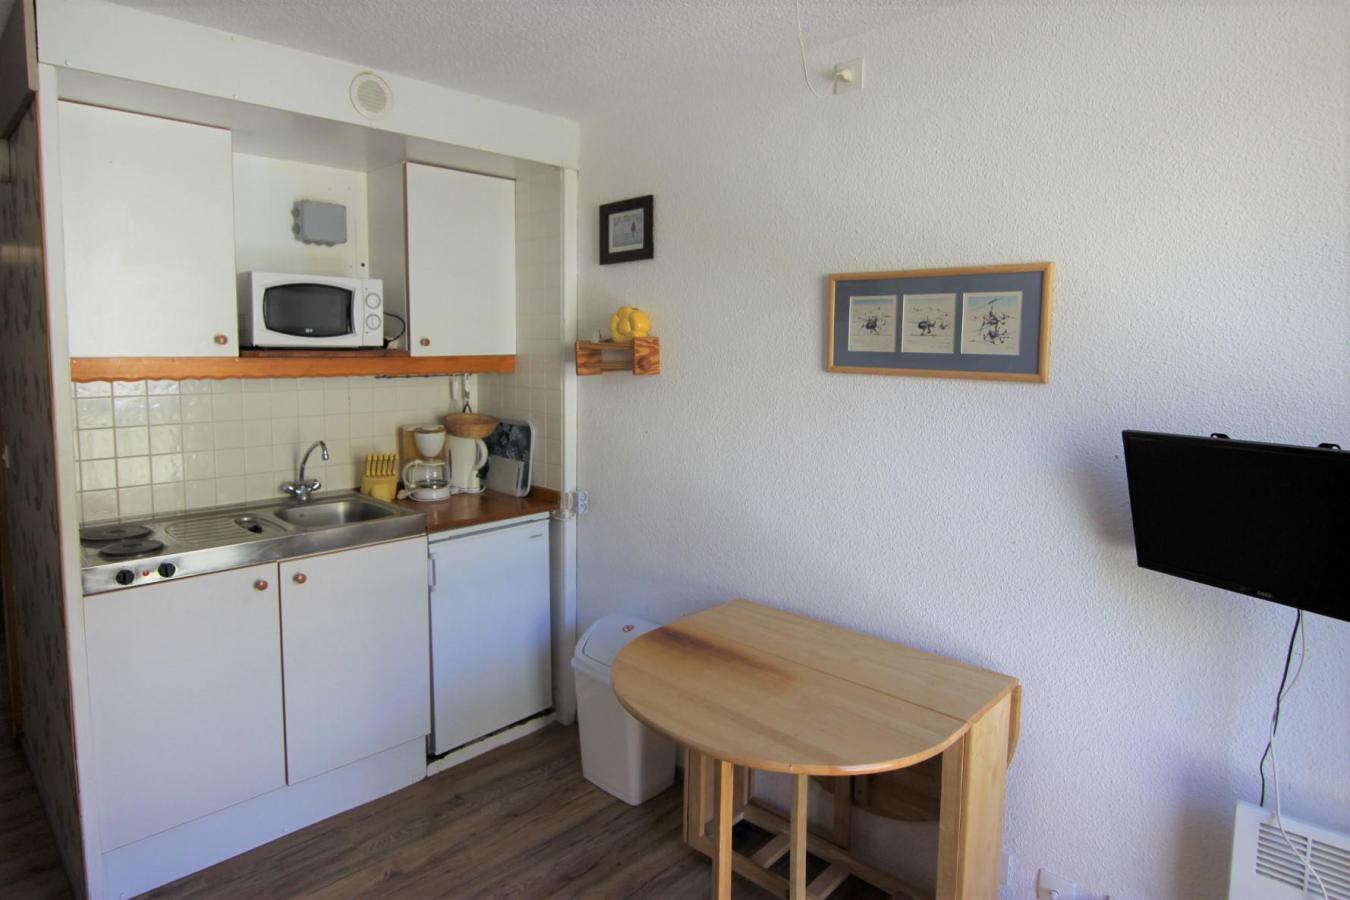 Location au ski Studio 2 personnes (126) - Residence Roche Blanche - Val Thorens - Séjour